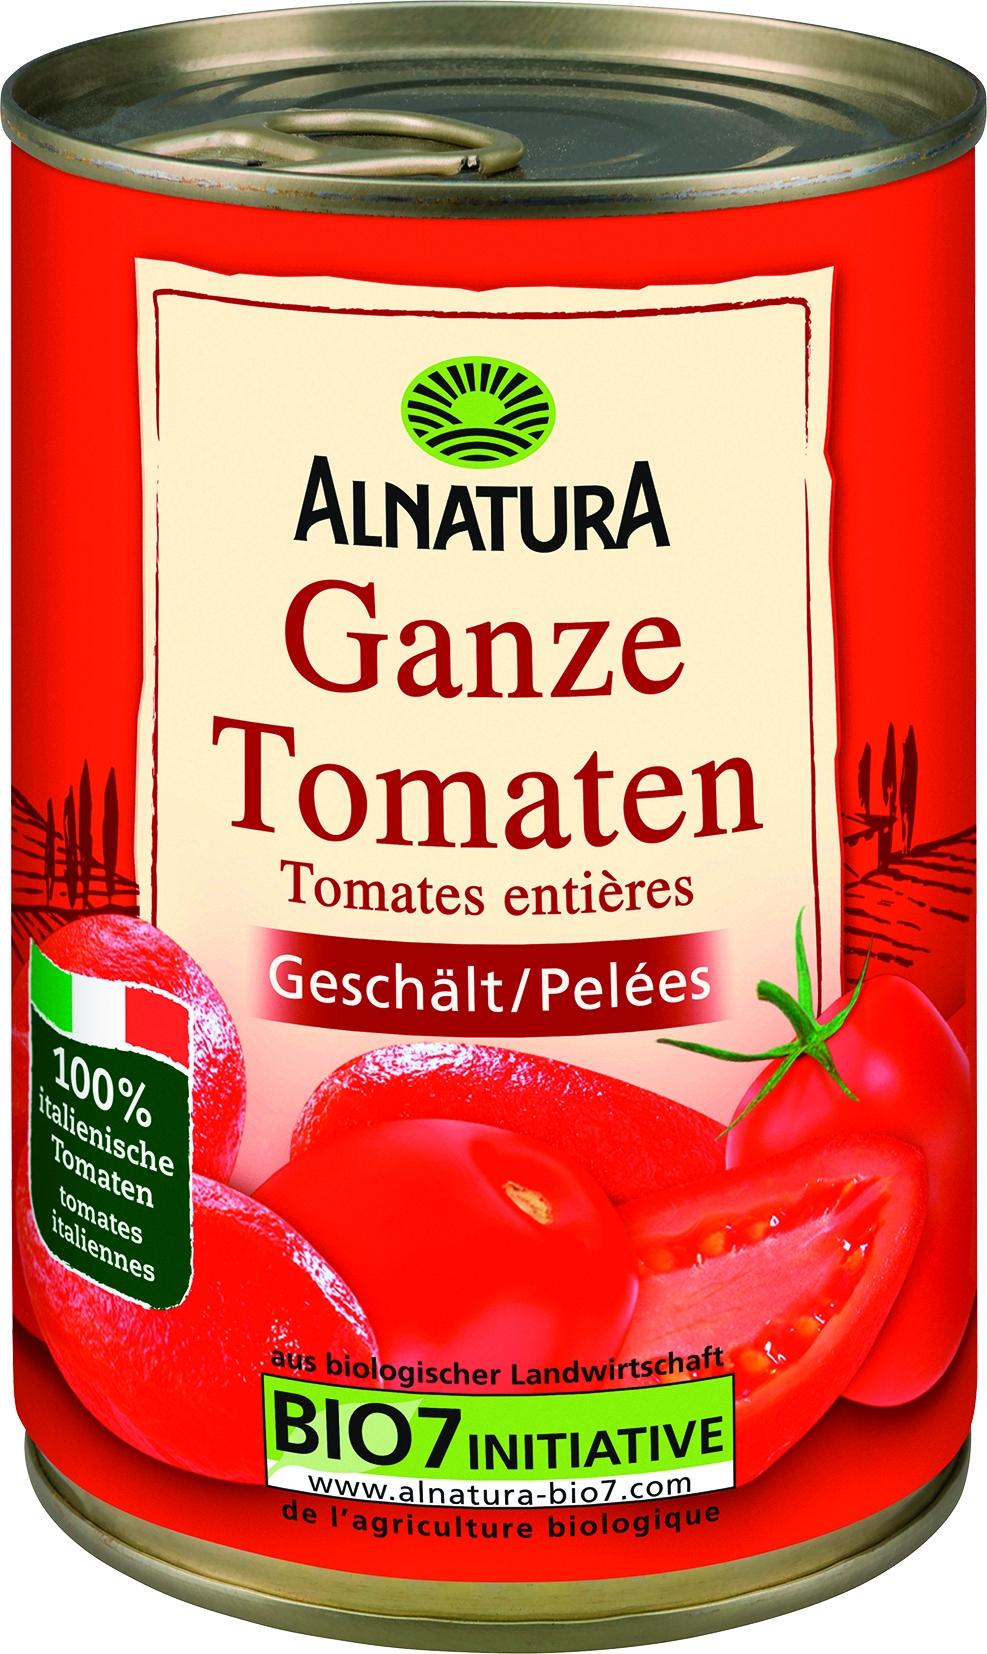 Ganze Tomaten